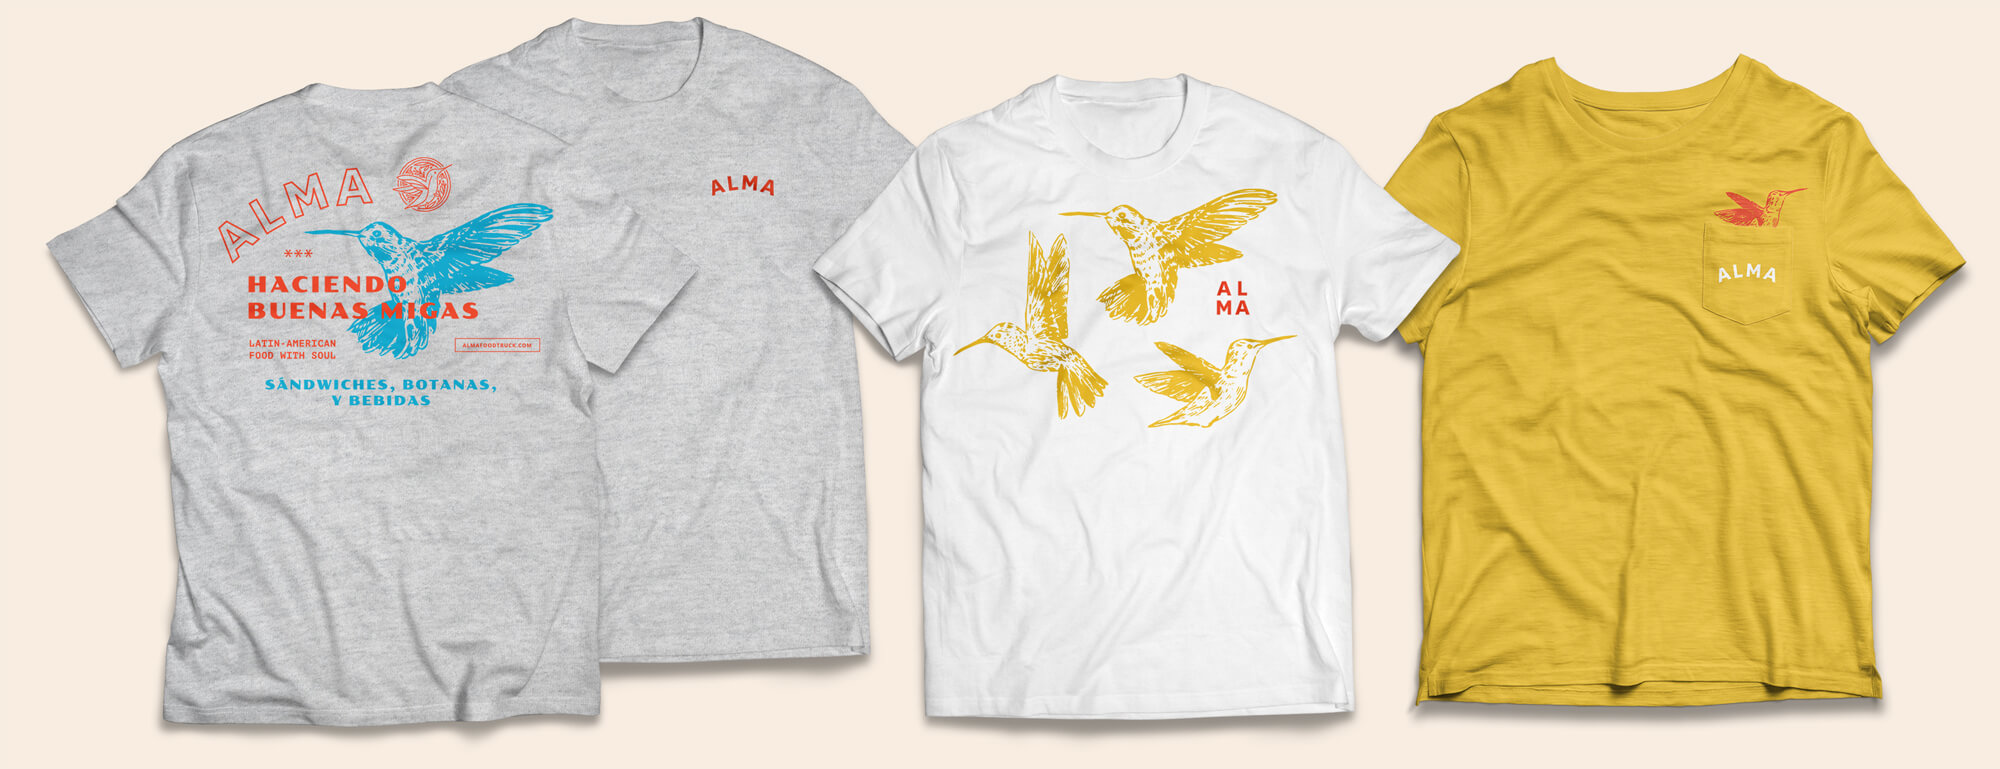 Remo-Remo-Design-ALMA-CS-Shirts.jpg